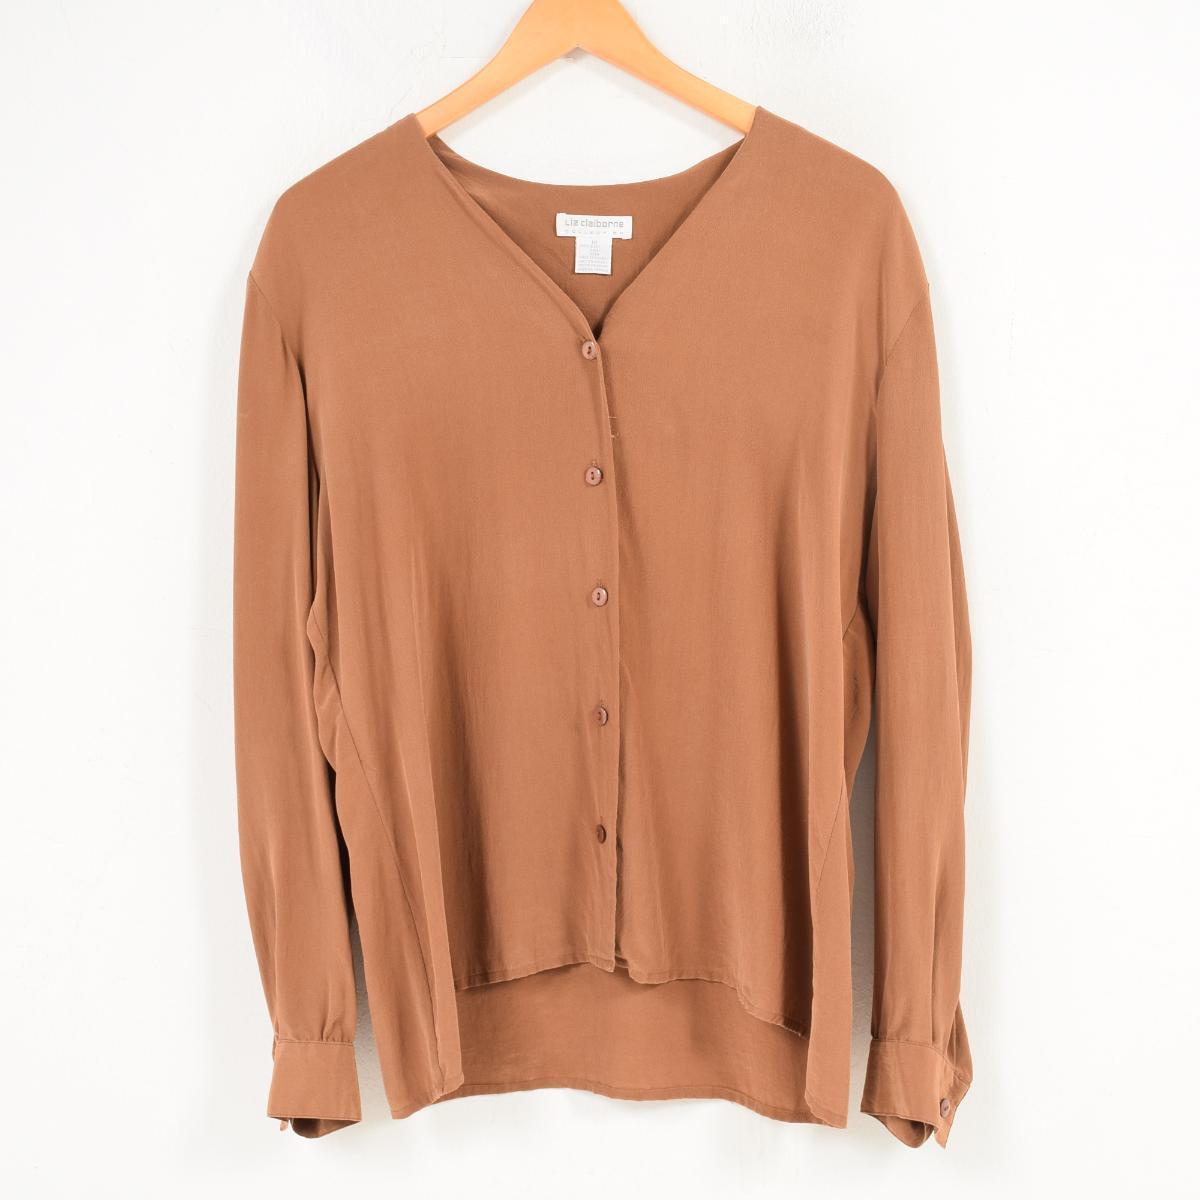 879eae9da4a117 Riz Claiborne Liz Claiborne no-collar long sleeves silk shirt Lady's L  /wat8583 ...